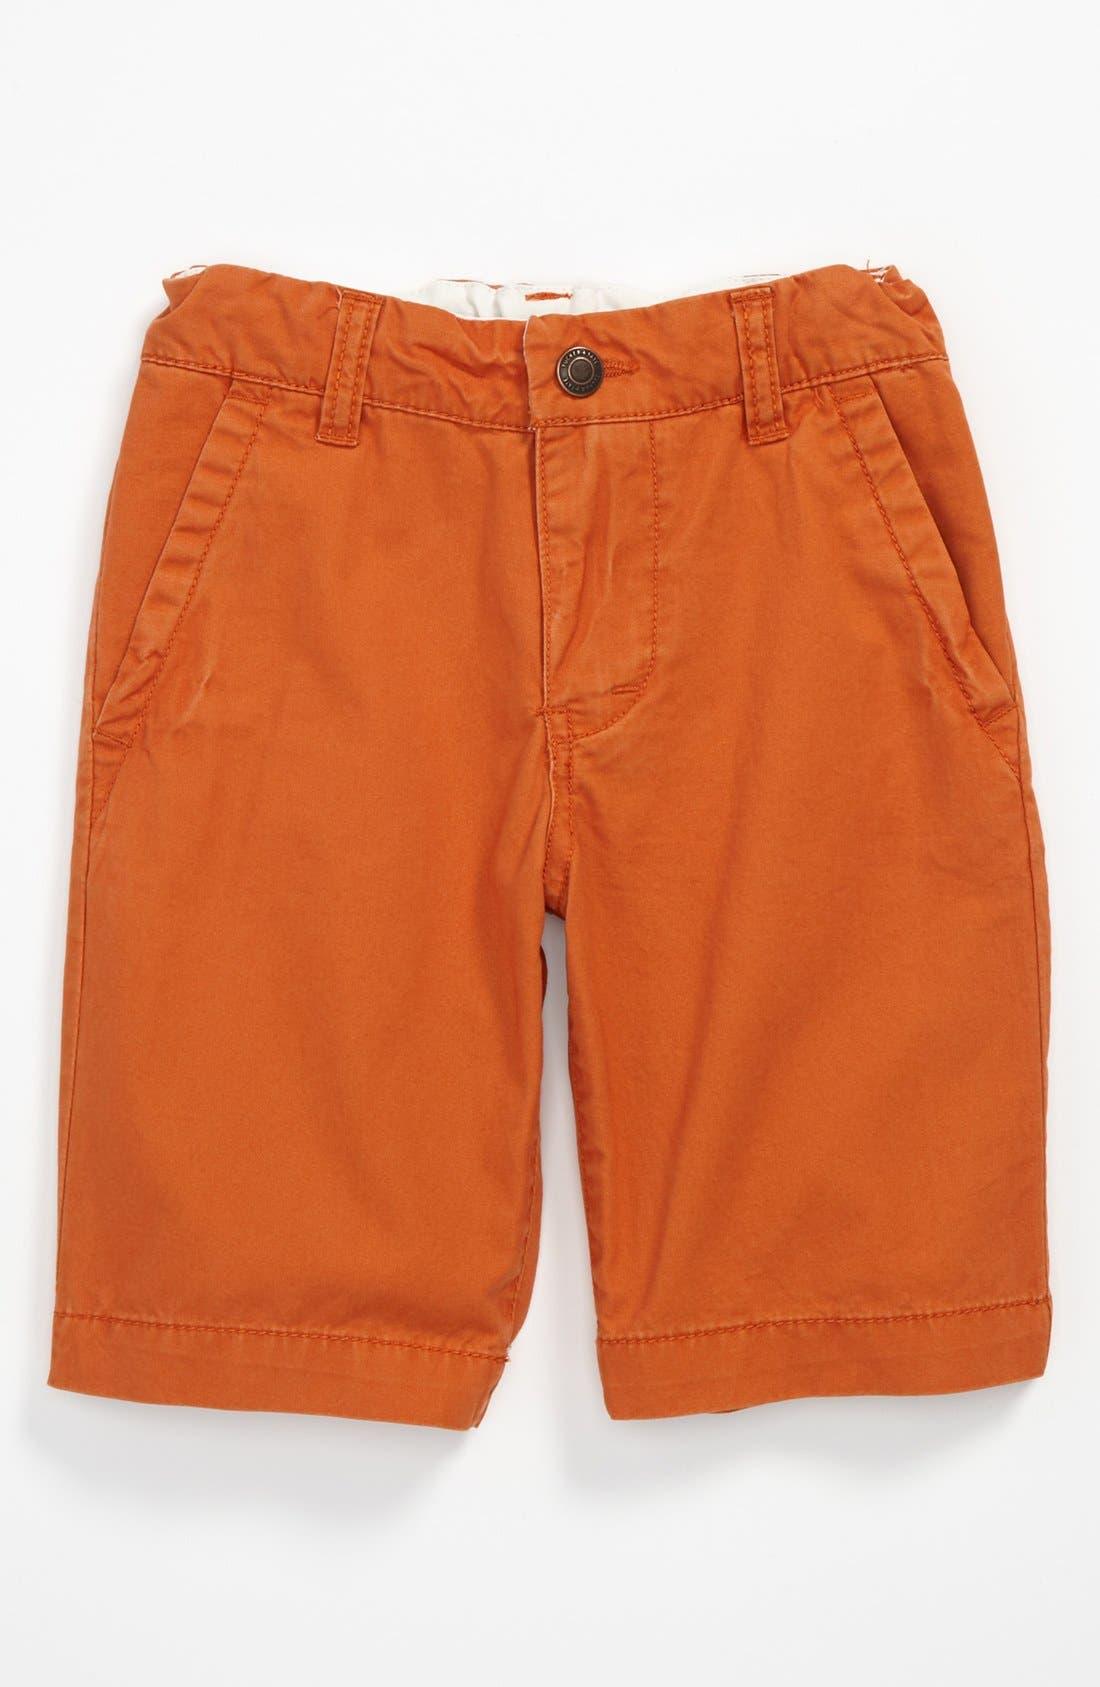 Main Image - Tucker + Tate 'Stunt' Chino Shorts (Toddler Boys)